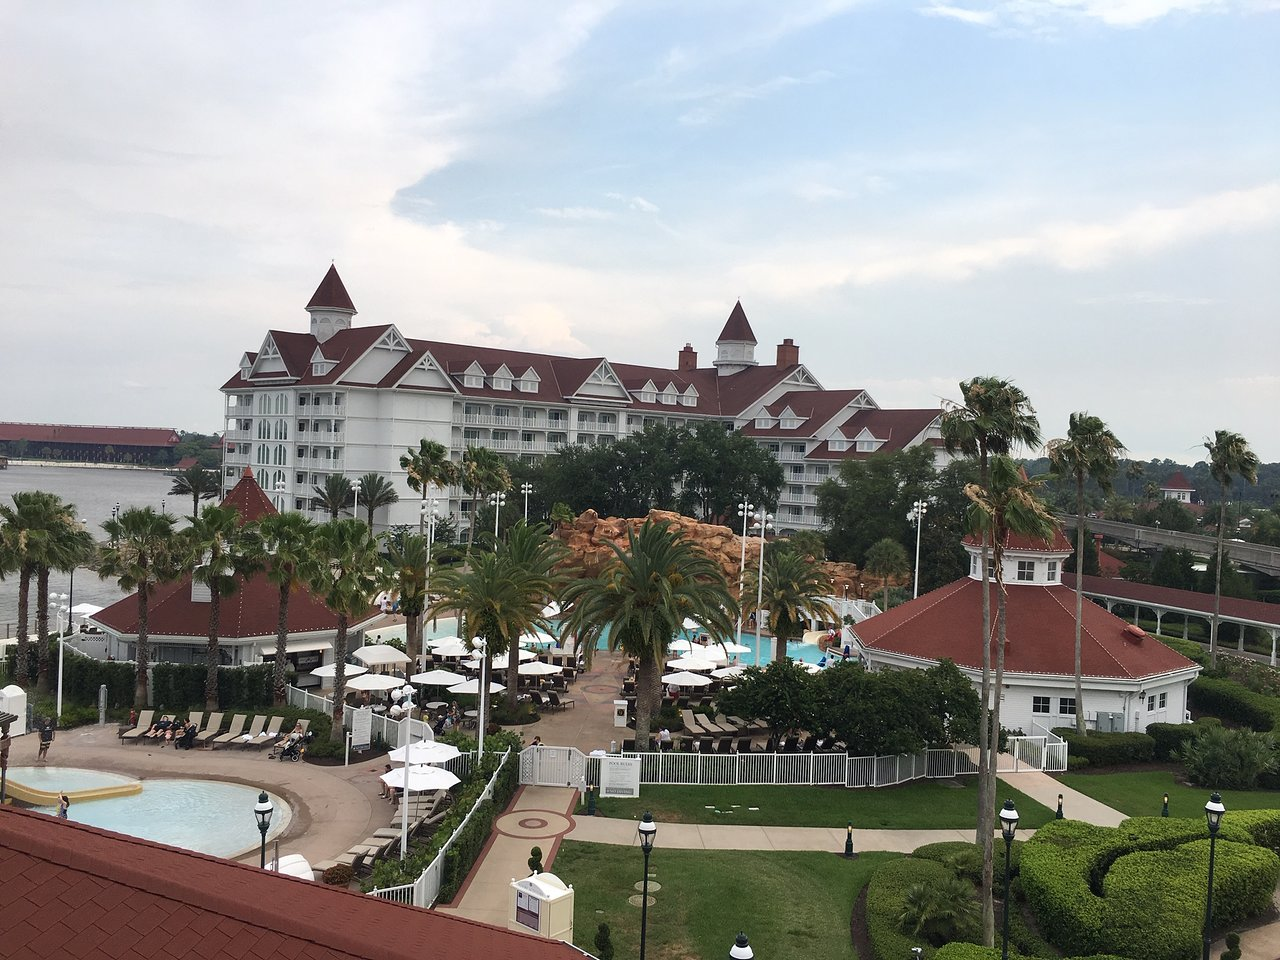 Disney's Grand Floridian Resort and Spa Exterior